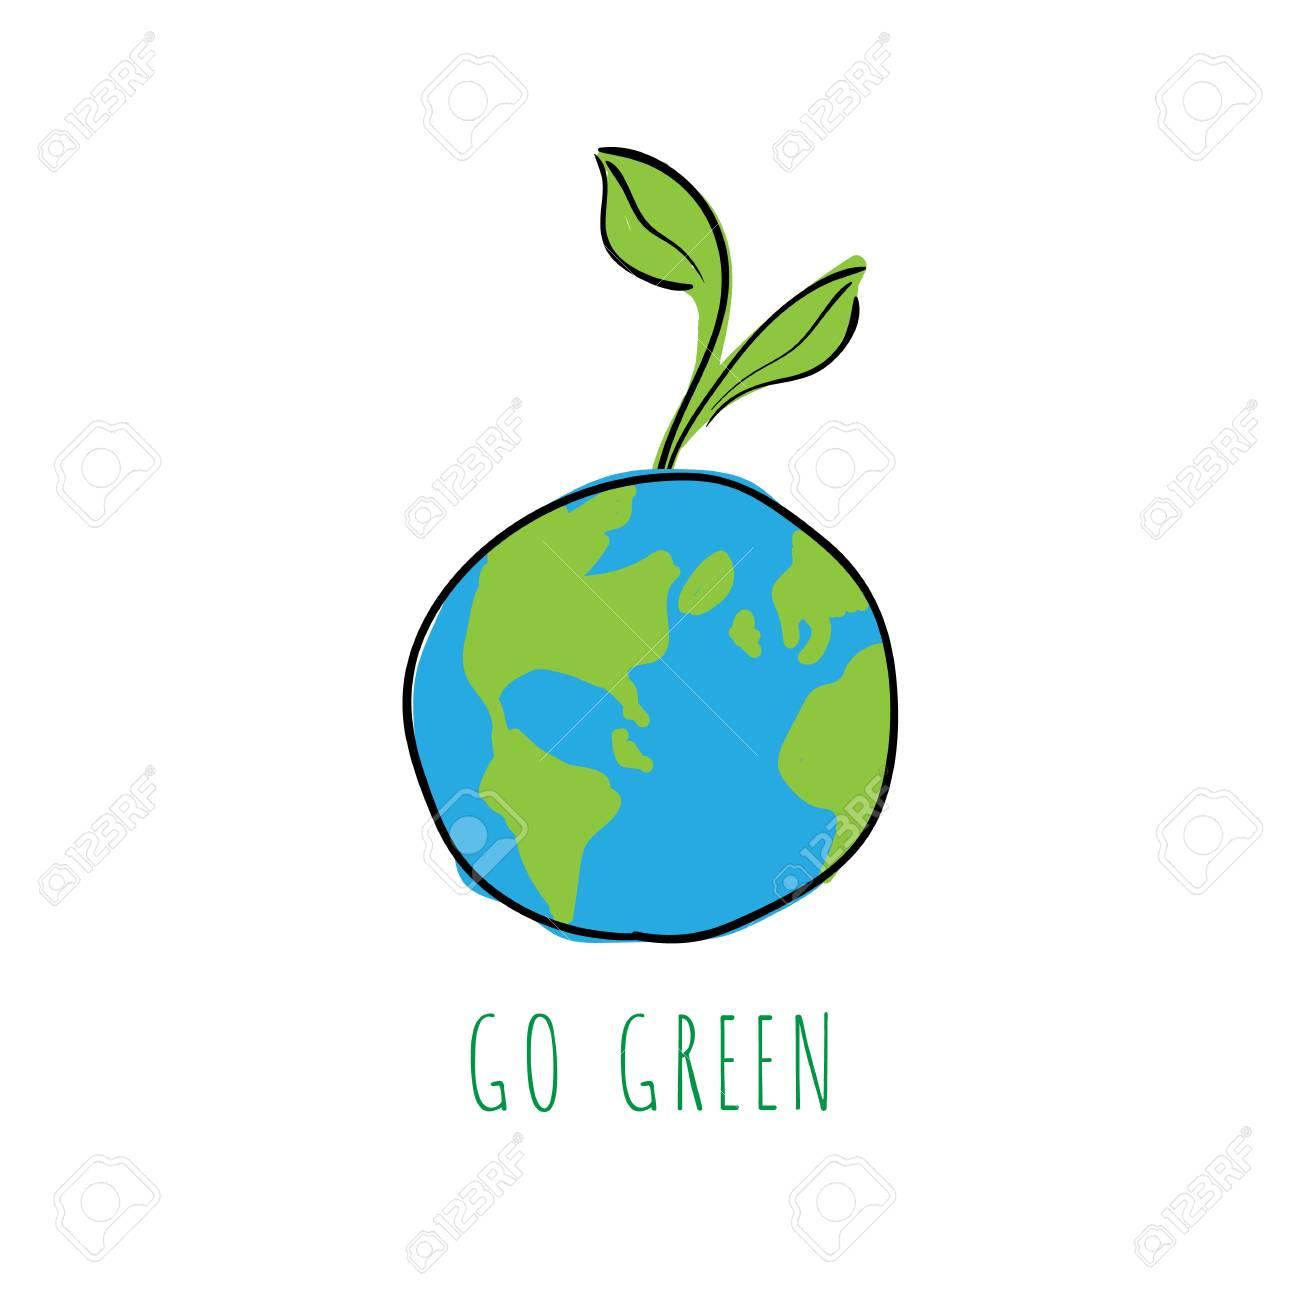 go green logo representing saving earth saving environment rh 123rf com go green logos free go green logo png